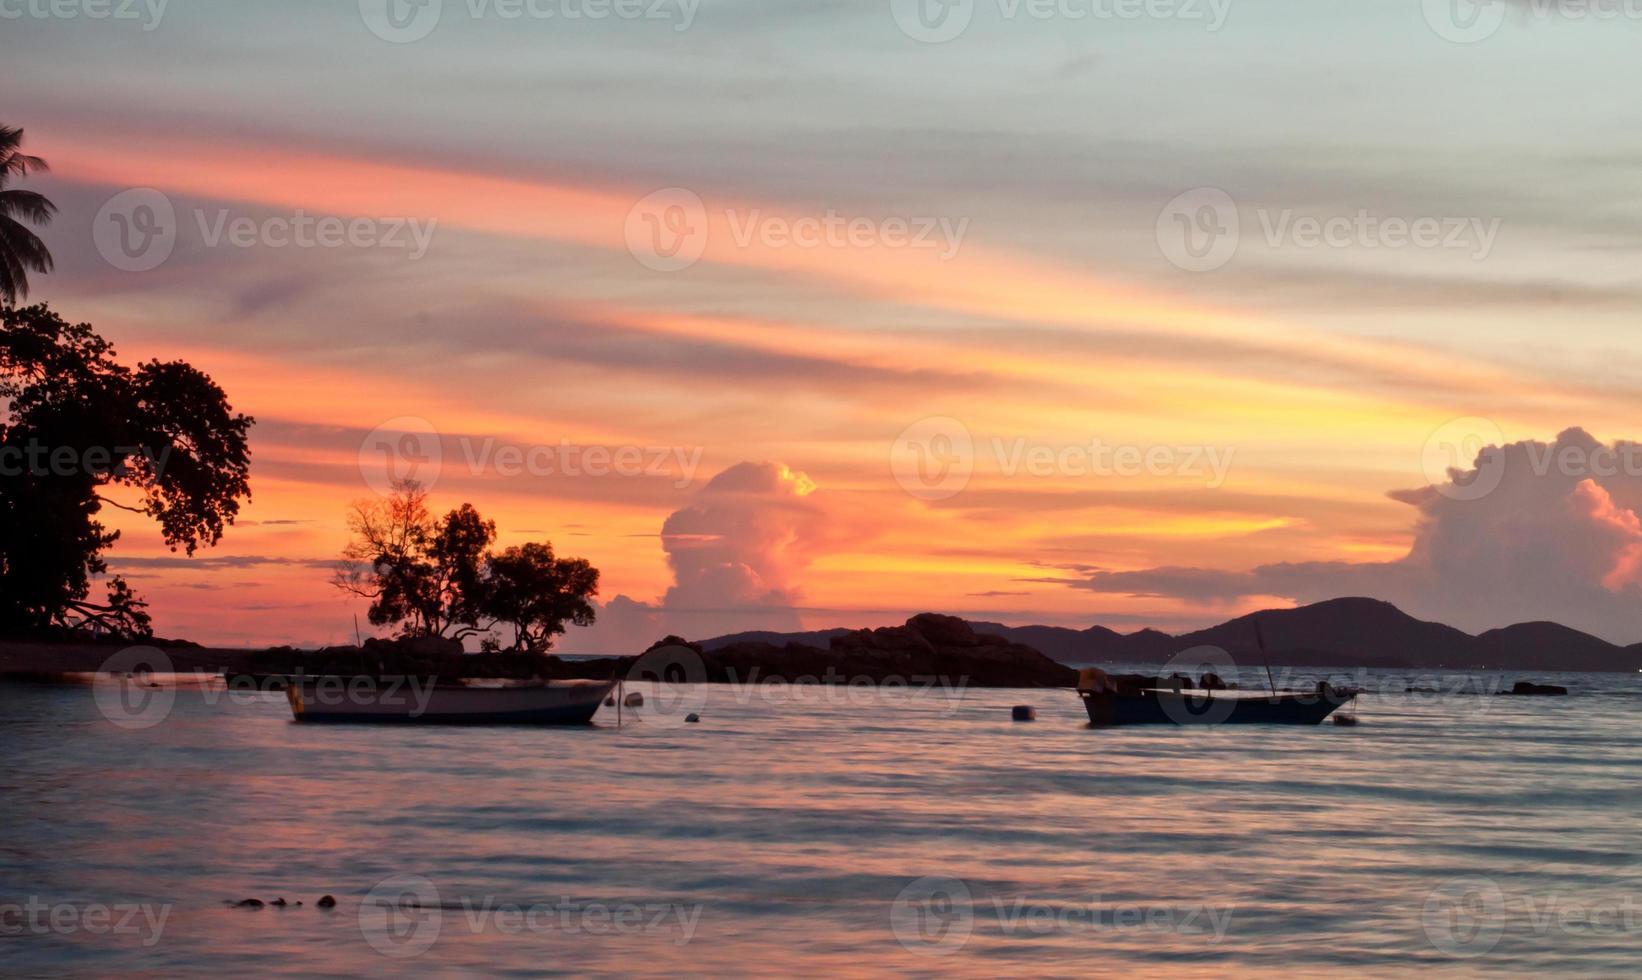 Pattaya, Tailandia, spiaggia di Wongamat al tramonto (vista koh larn) foto